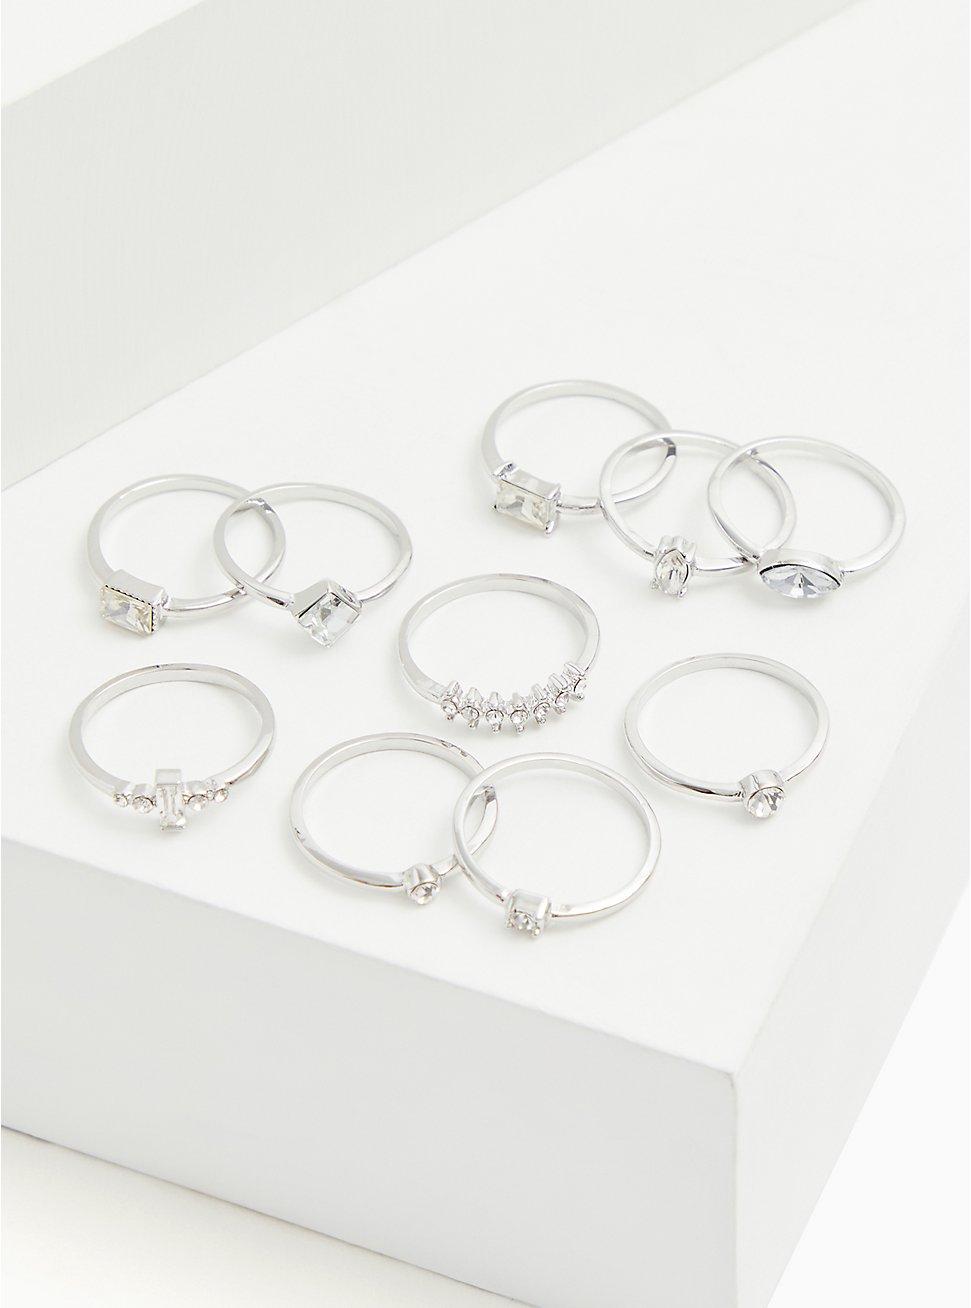 Plus Size Silver-Tone Rhinestone Ring Set - Set of 10, SILVER, hi-res